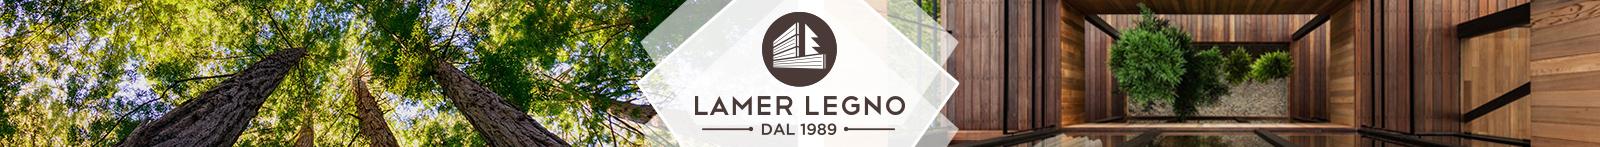 LamerLegno